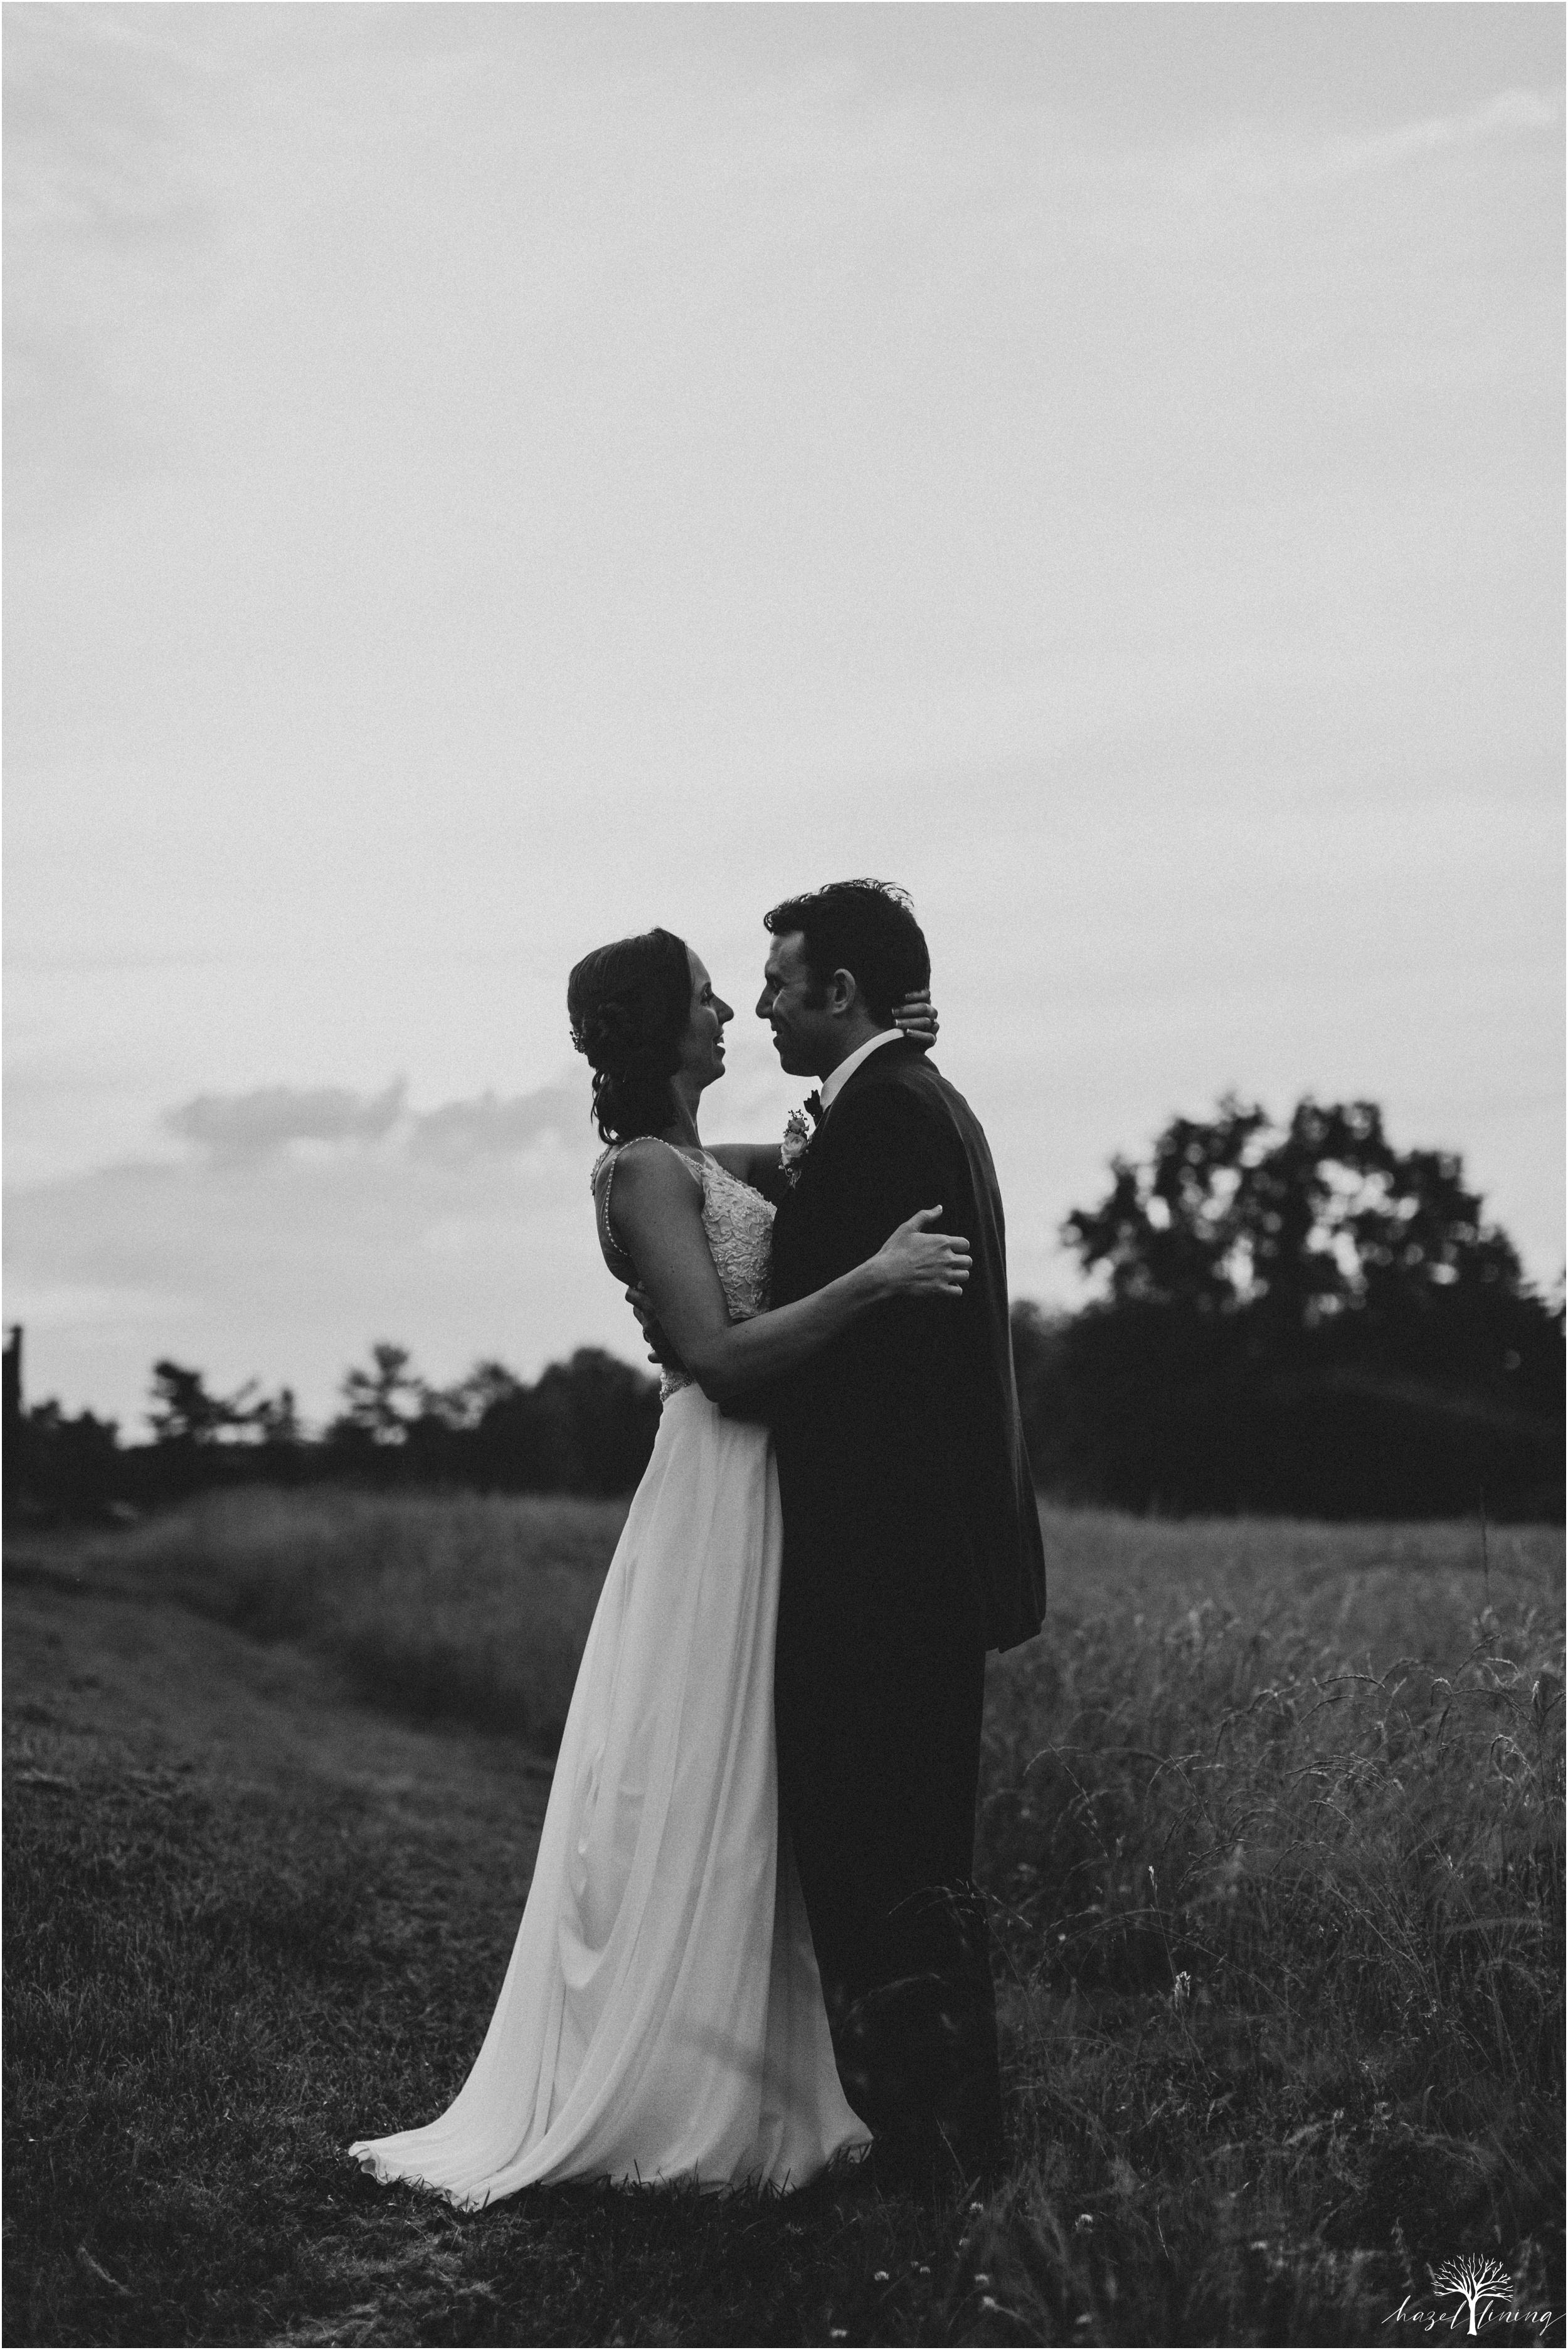 hazel-lining-travel-wedding-elopement-photography_0177.jpg